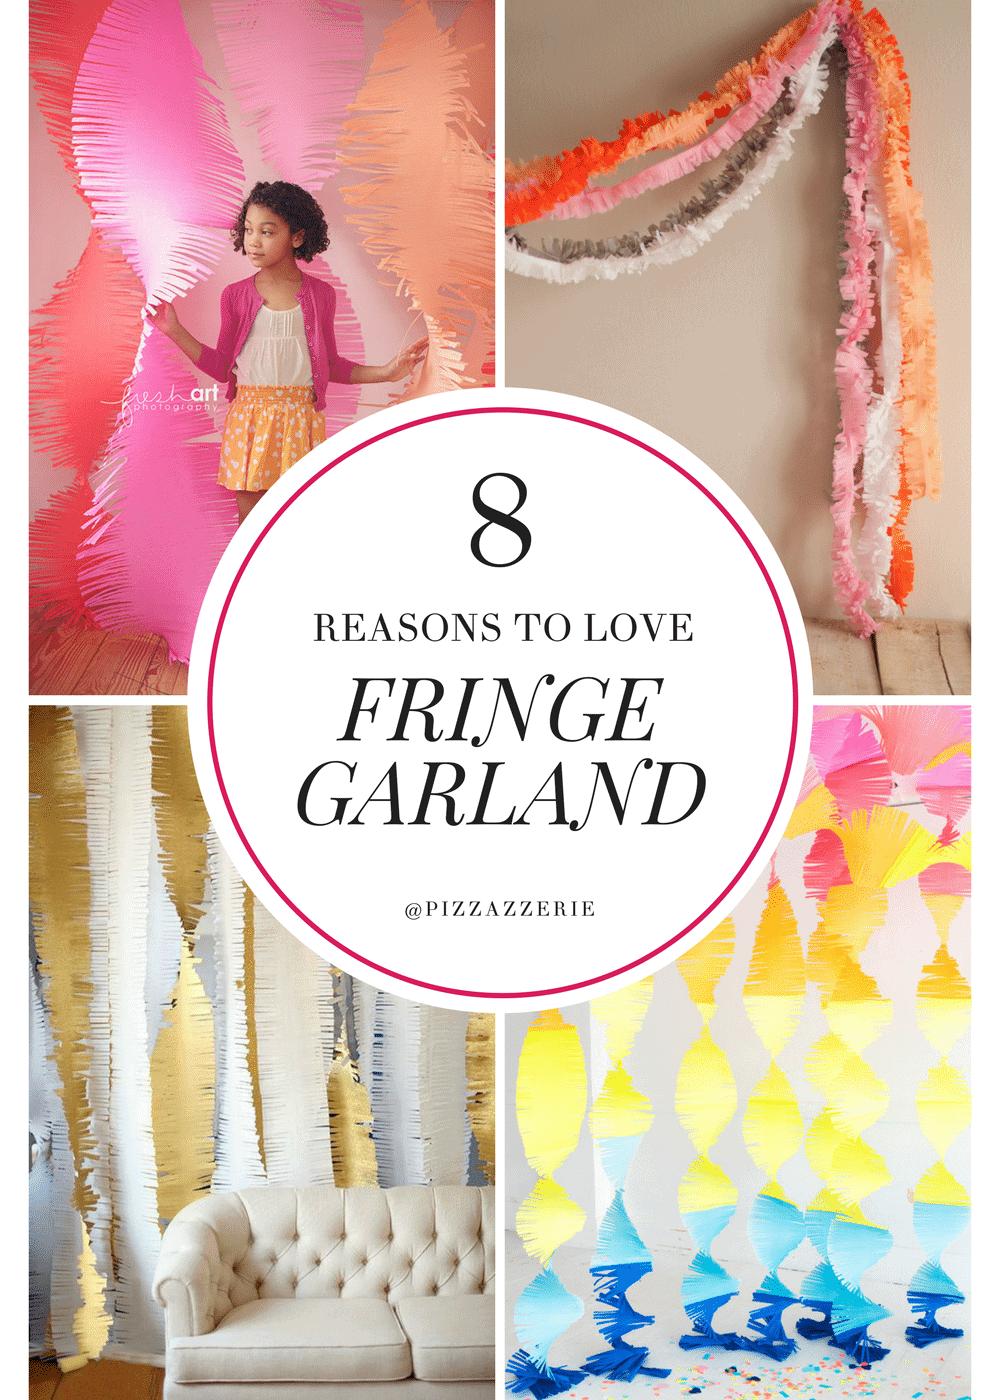 FRINGE GARLAND, how to make it, fringe garland streamers, creative party inspiration!